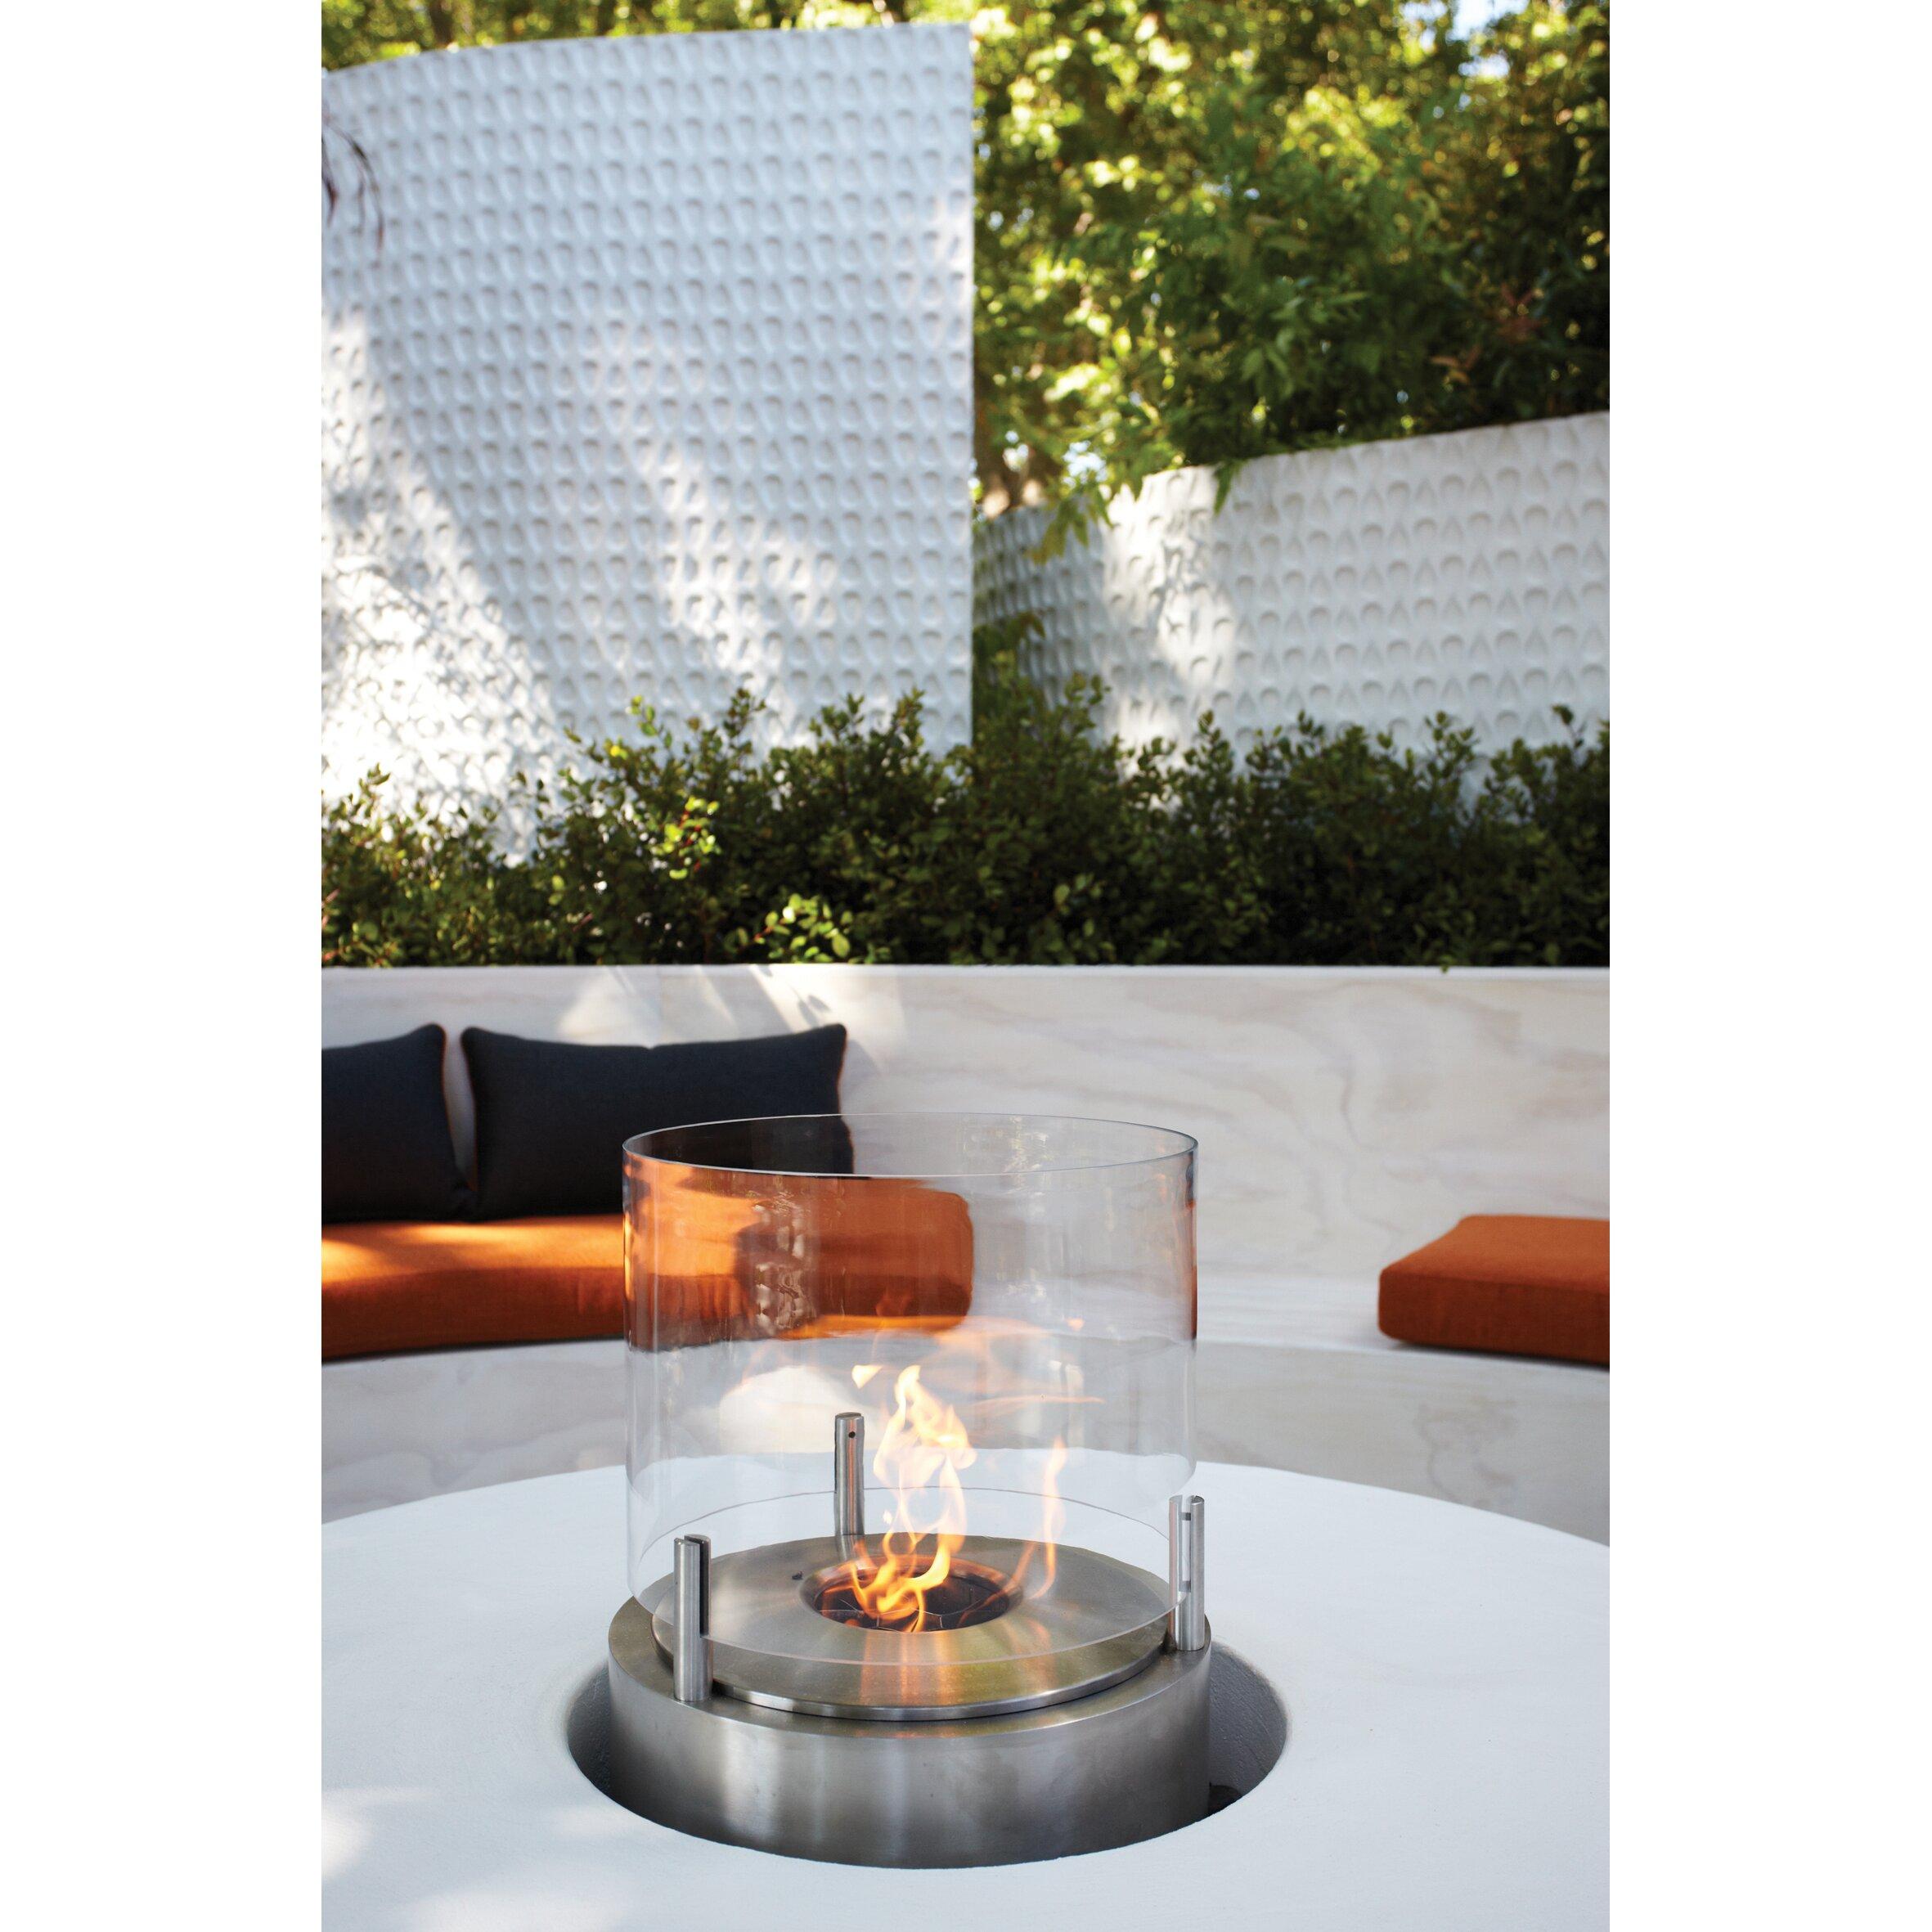 ecosmart cyl bio ethanol tabletop fireplace wayfair